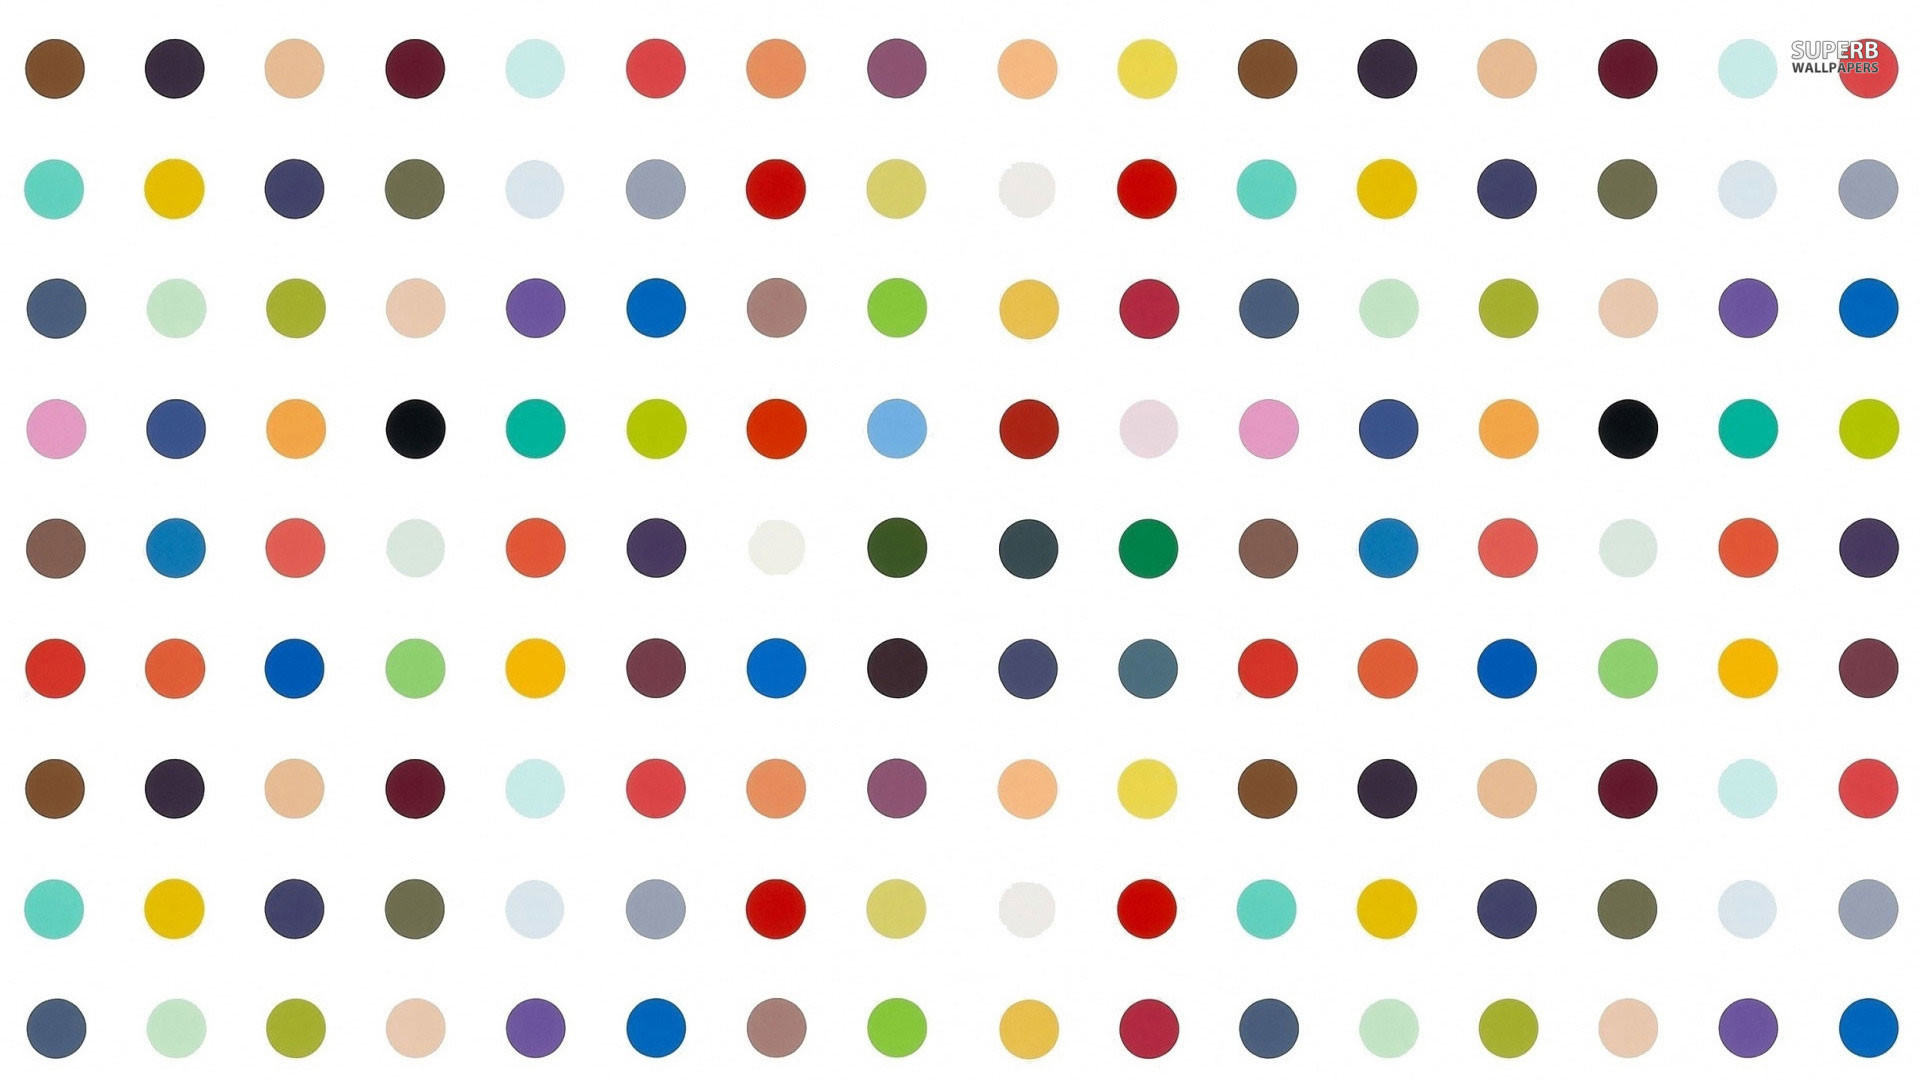 hd pics photos stunning attractive polka dots 26 hd desktop background  wallpaper